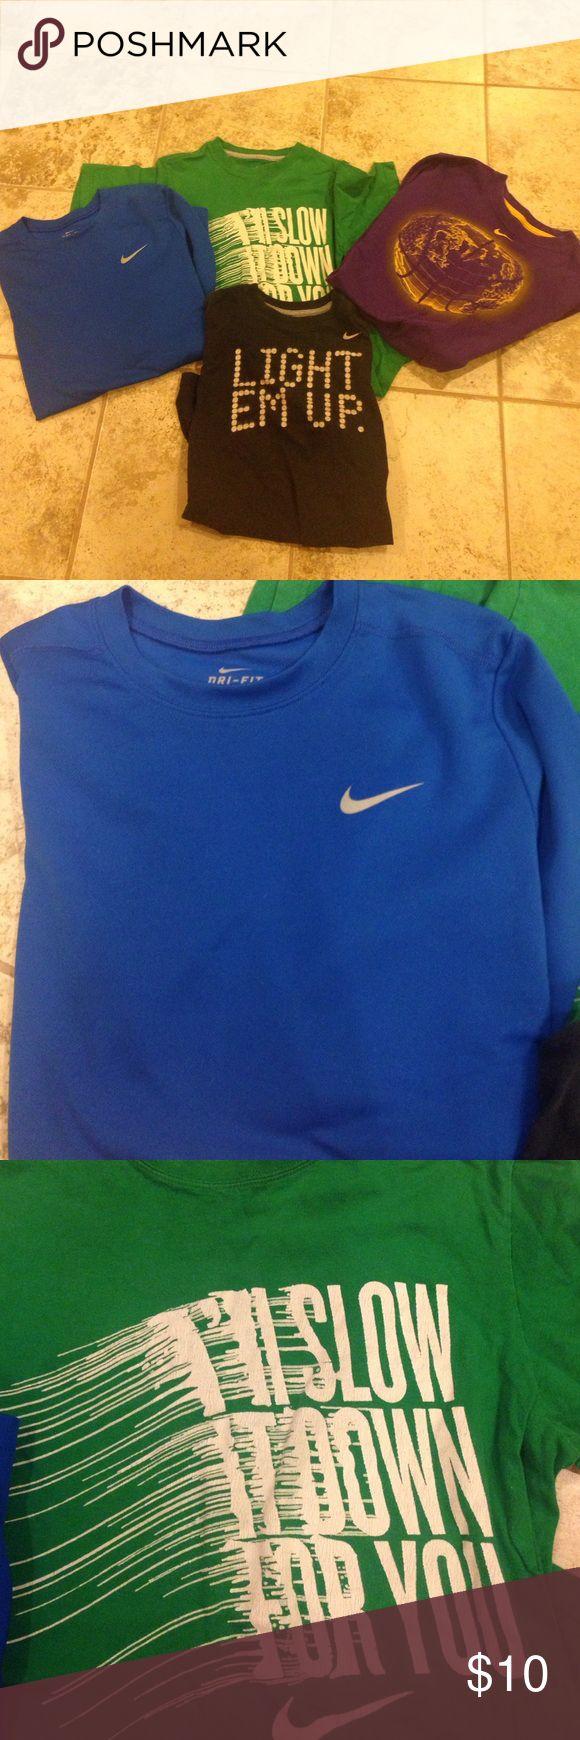 Boys Nike LOT Size Large XL Purple Long Tshirt Boys Nike LOT Size Large XL Purple Long Tshirt Nike Shirts & Tops Tees - Short Sleeve